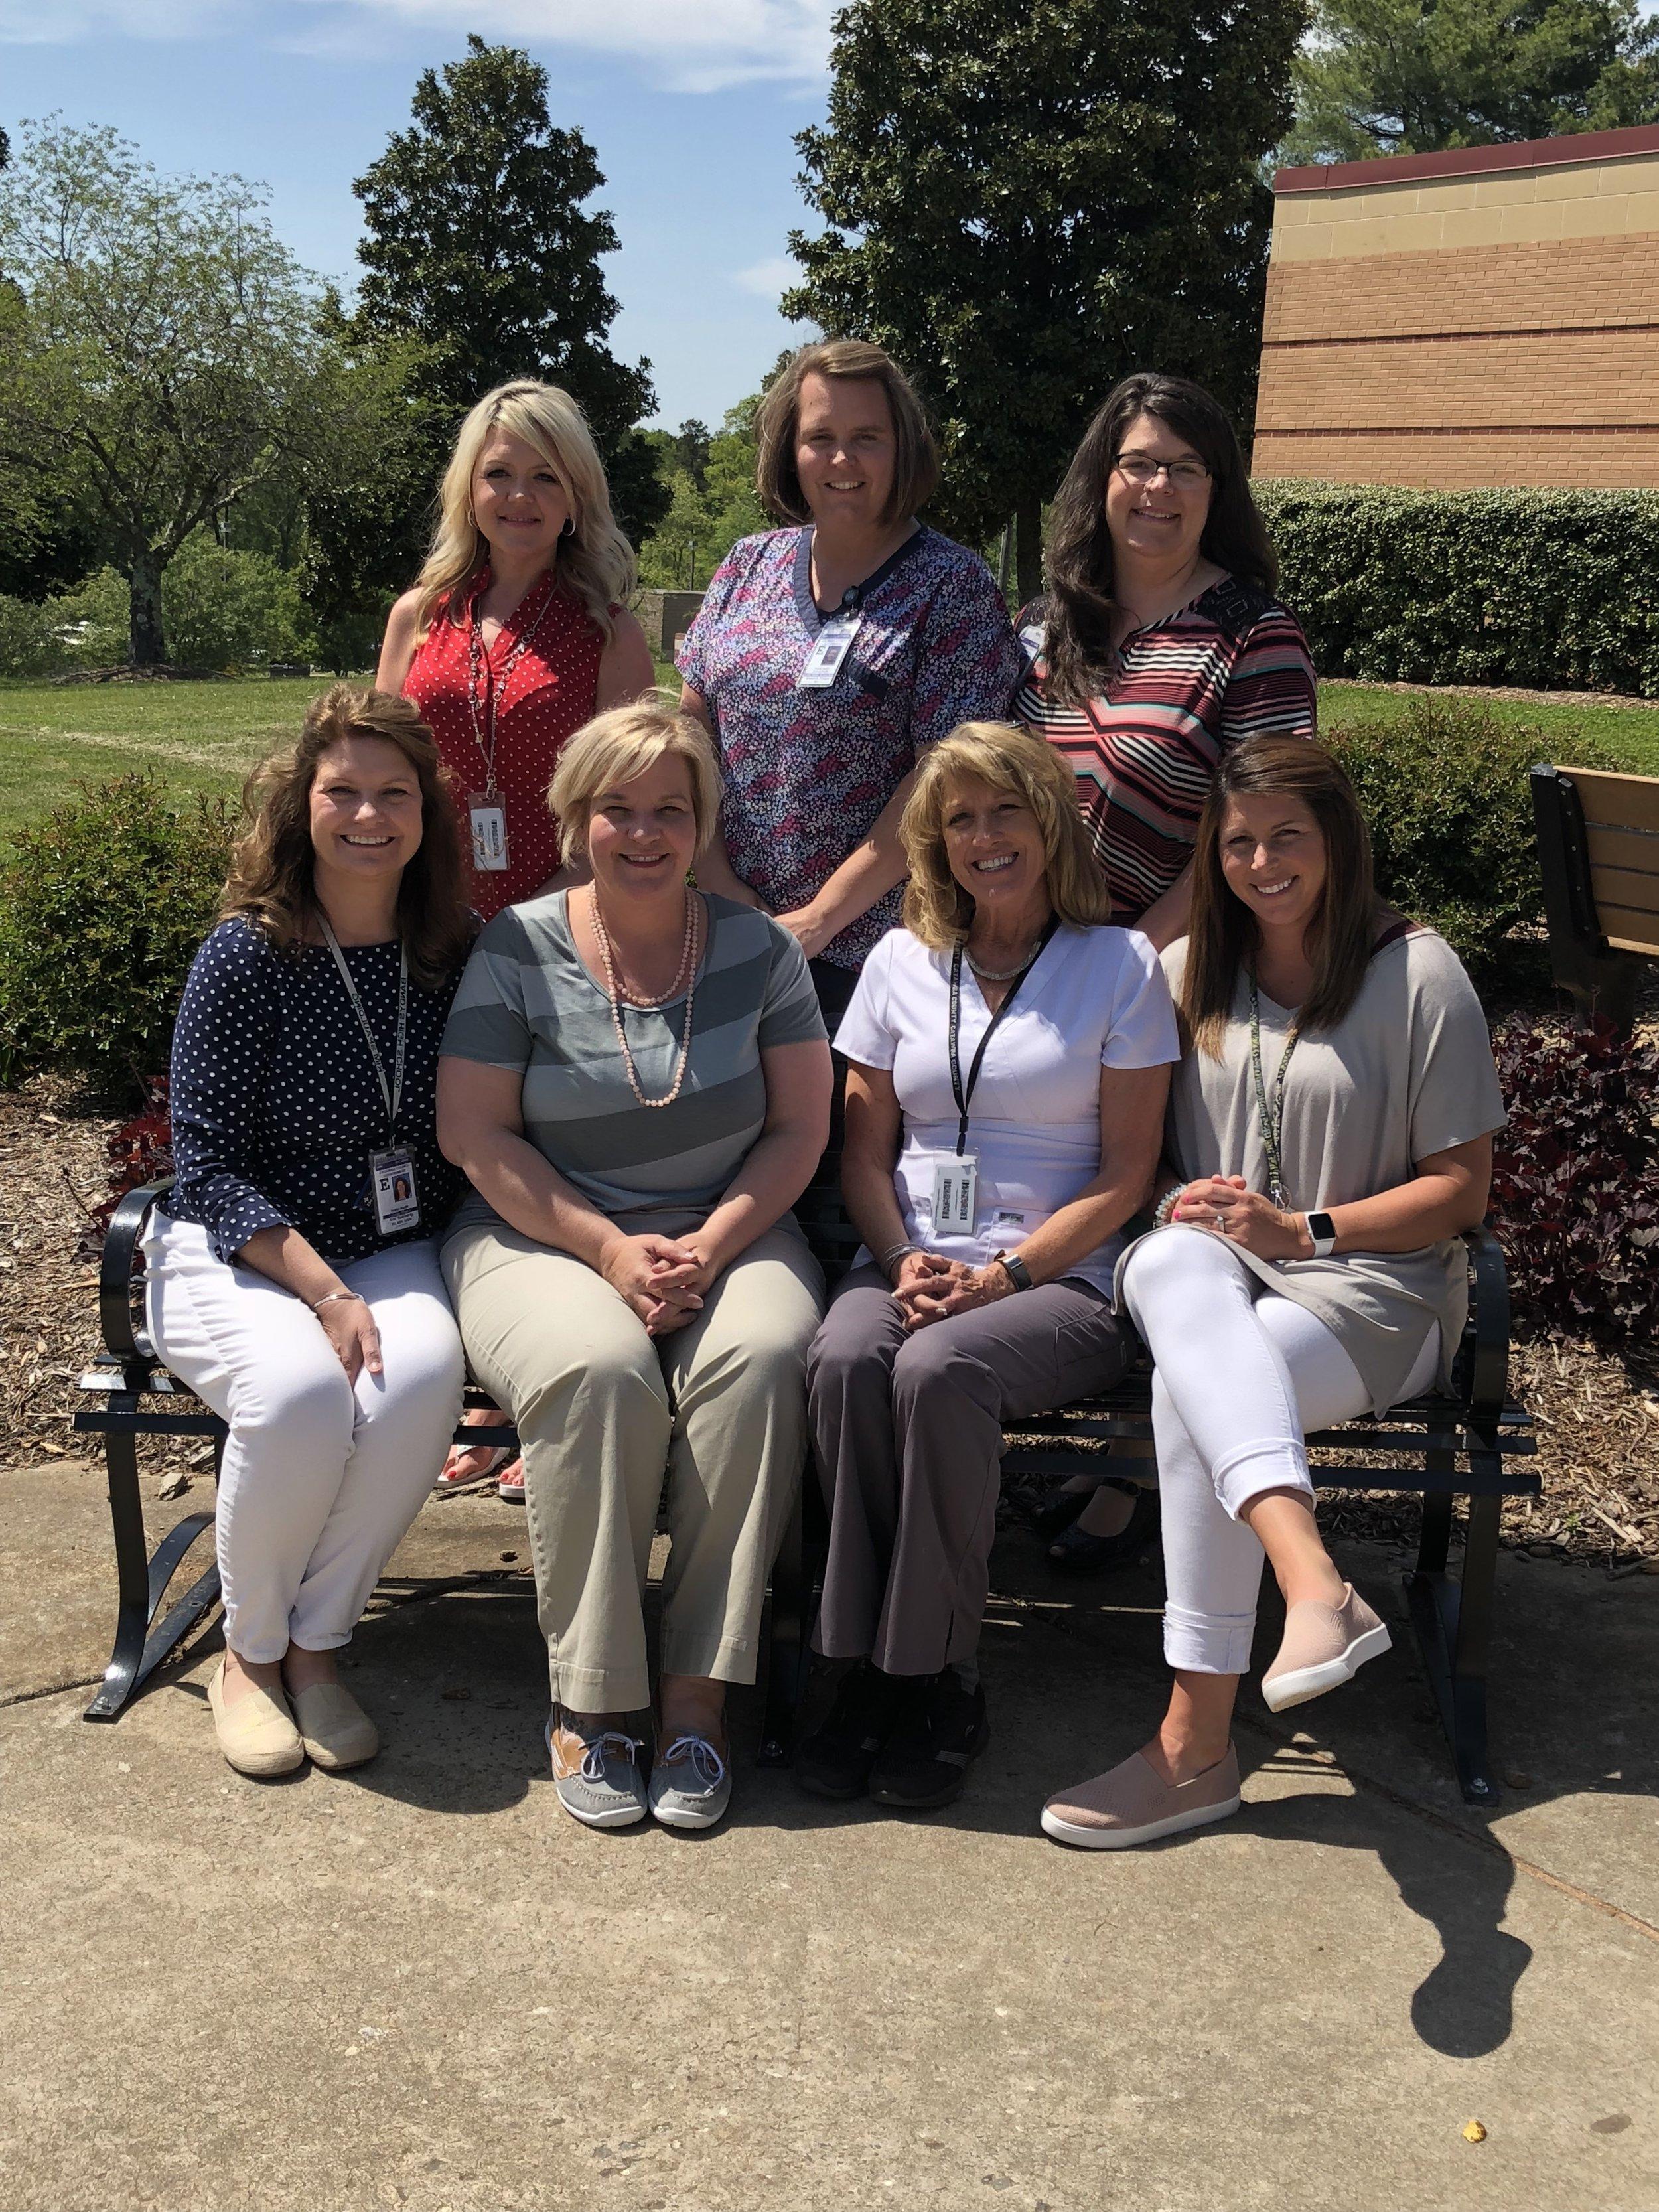 Catawba County Public Health School Nurse Research Team - Back Row L-R : Brandy Forbes, Krystal Morgan, Rachel KnightonFront Row L-R : Kim Spaulding, Melanie Reese, LaDonna Hodge, Holly Bennett